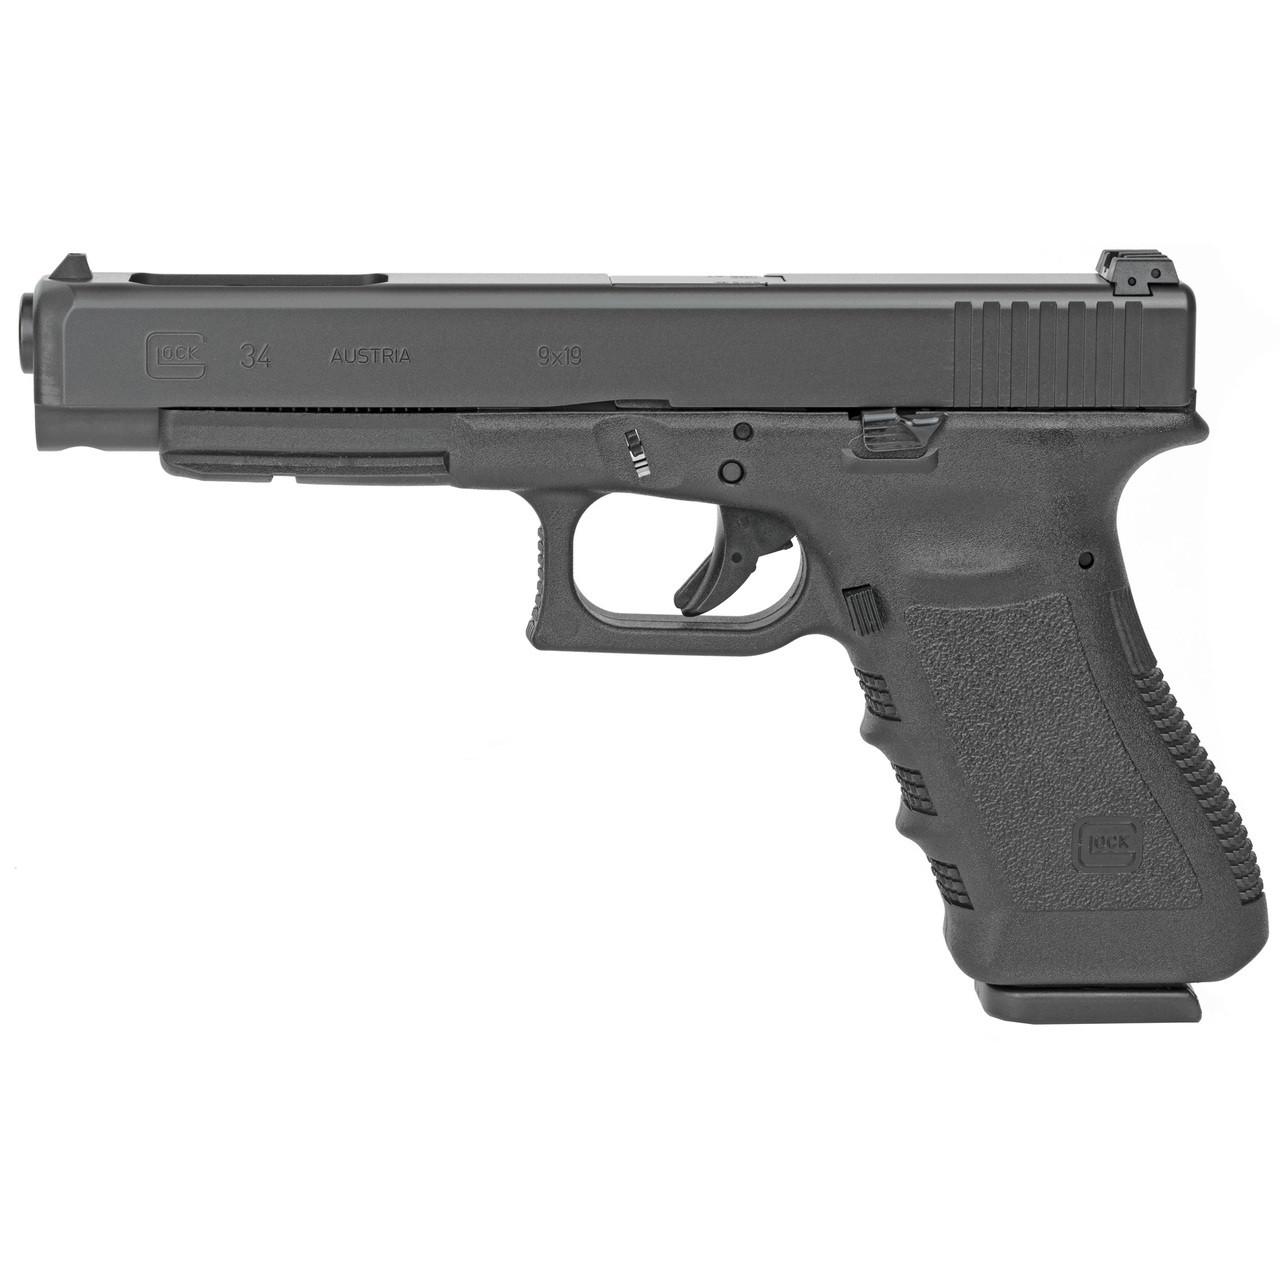 Glock 34 Gen3 CALIFORNIA LEGAL - 9mm